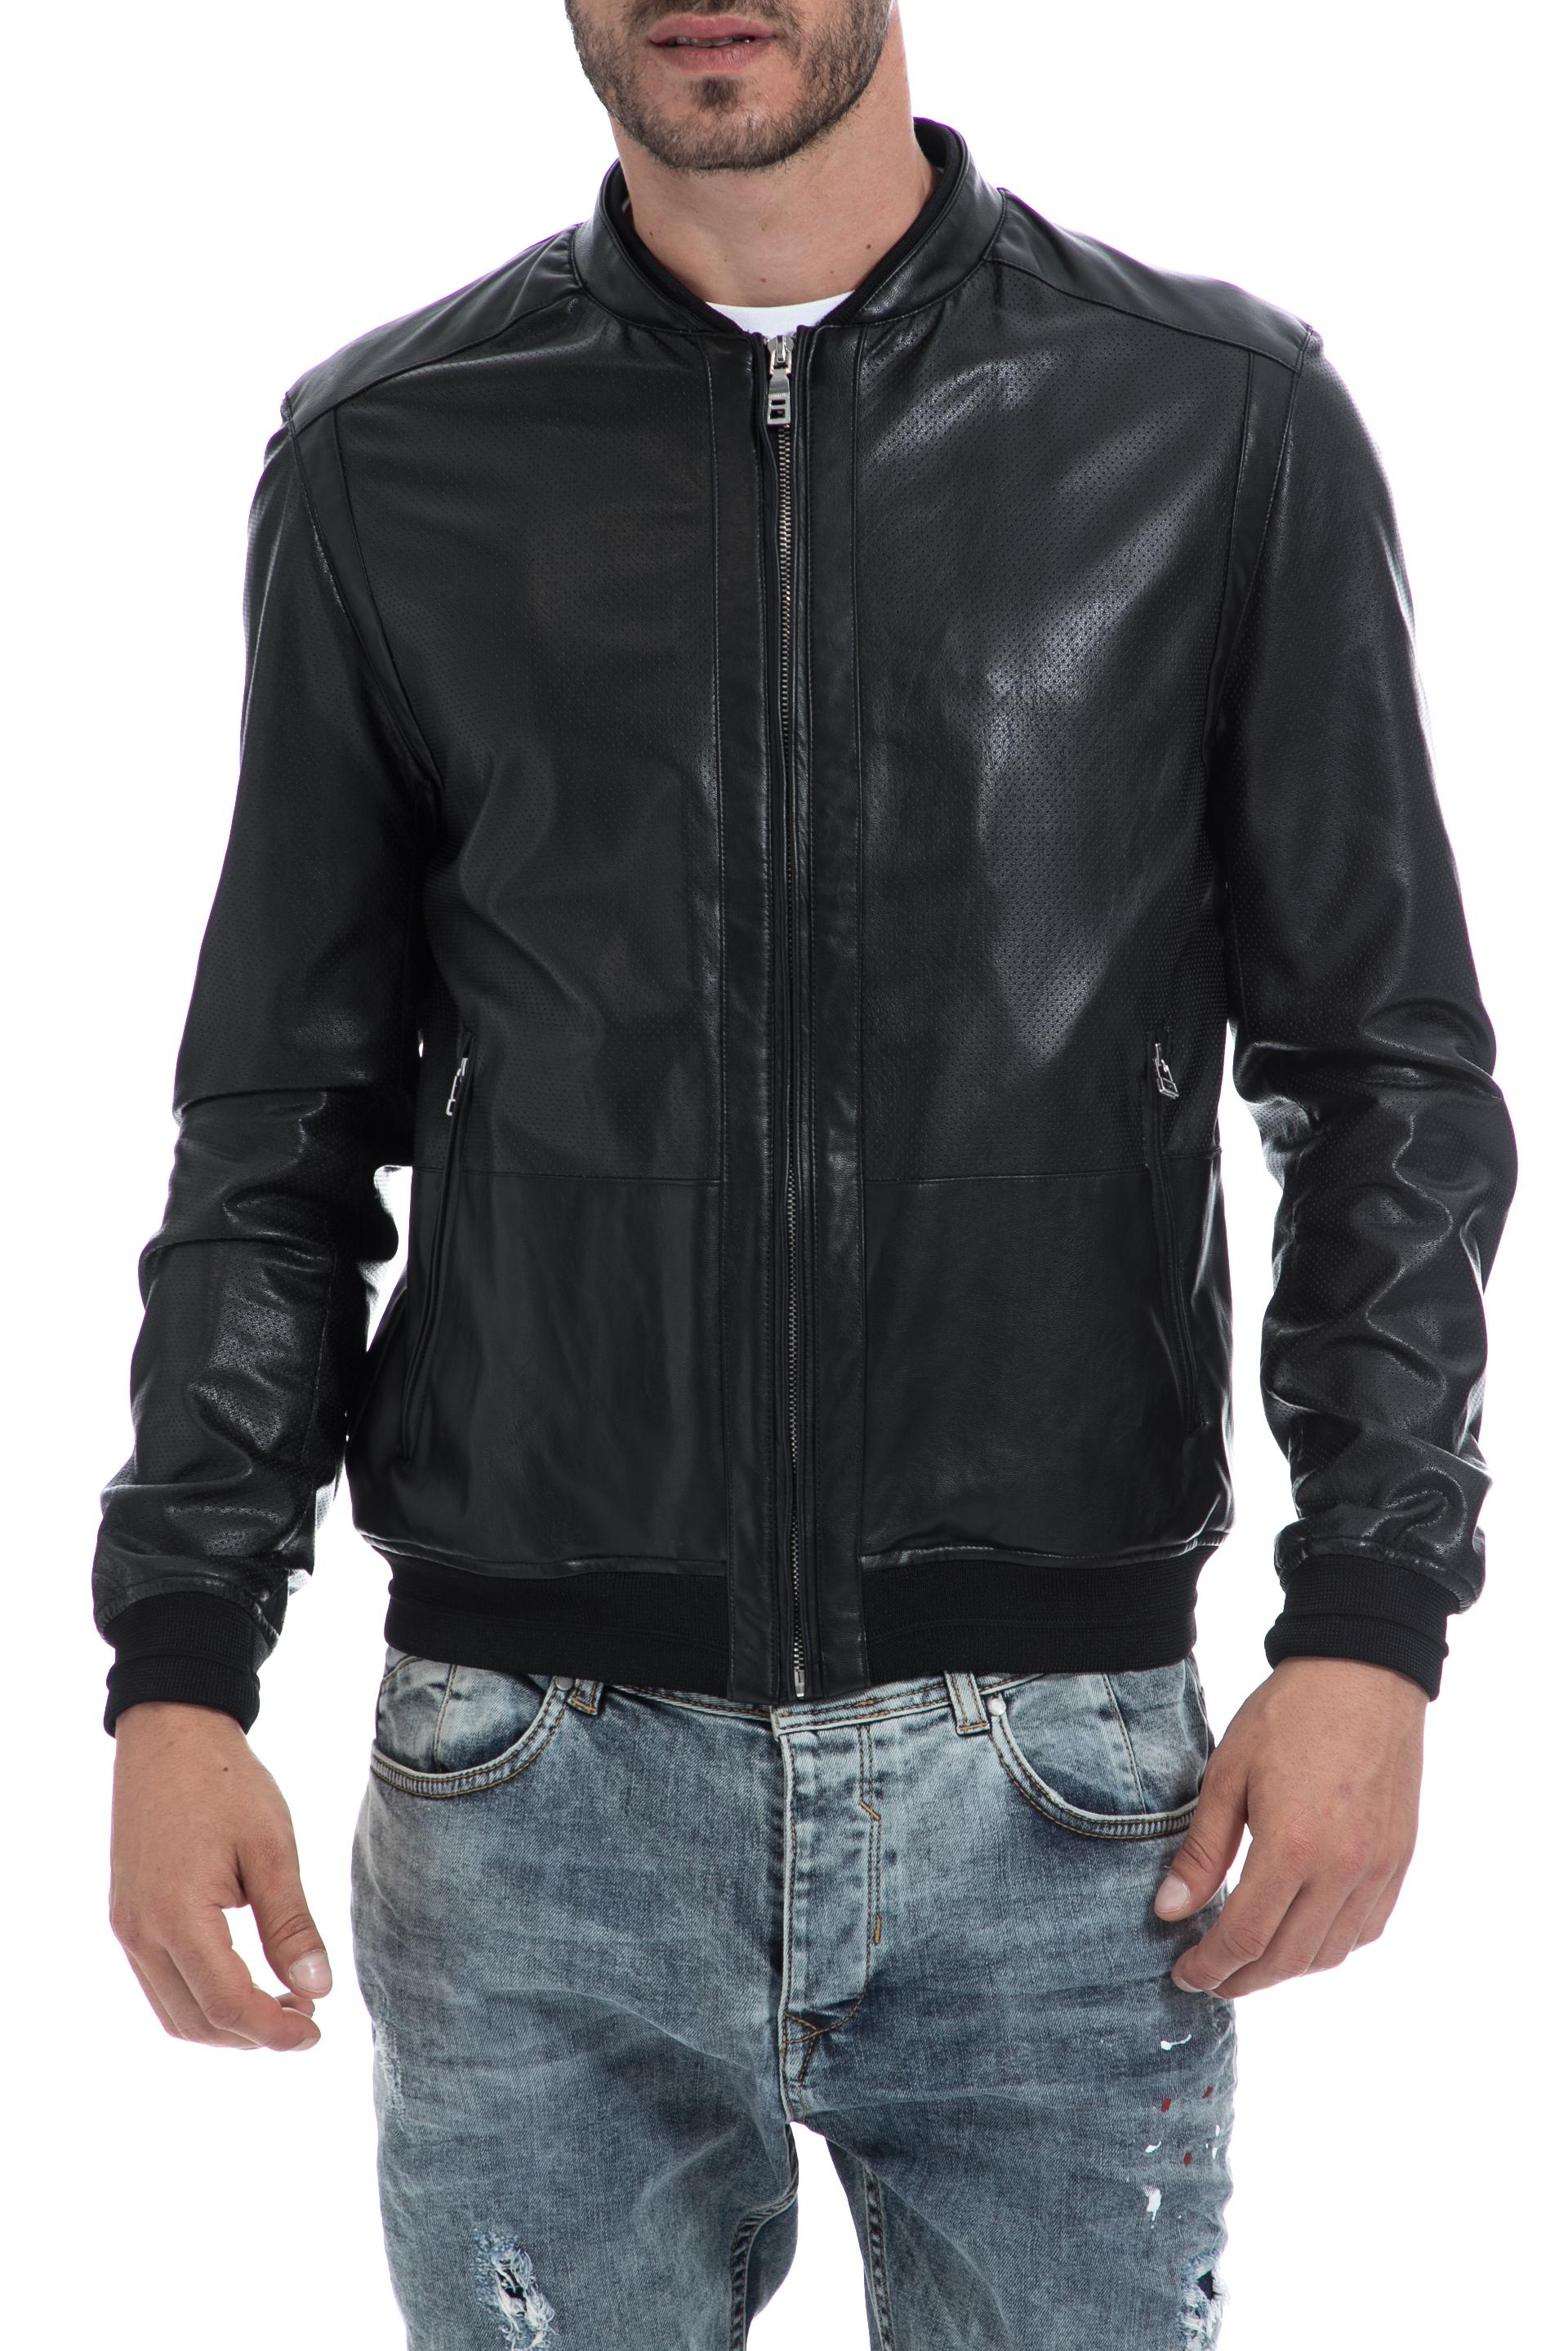 SSEINSE - Ανδρικό τζάκετ SSEINSE μαύρο ανδρικά ρούχα πανωφόρια τζάκετς